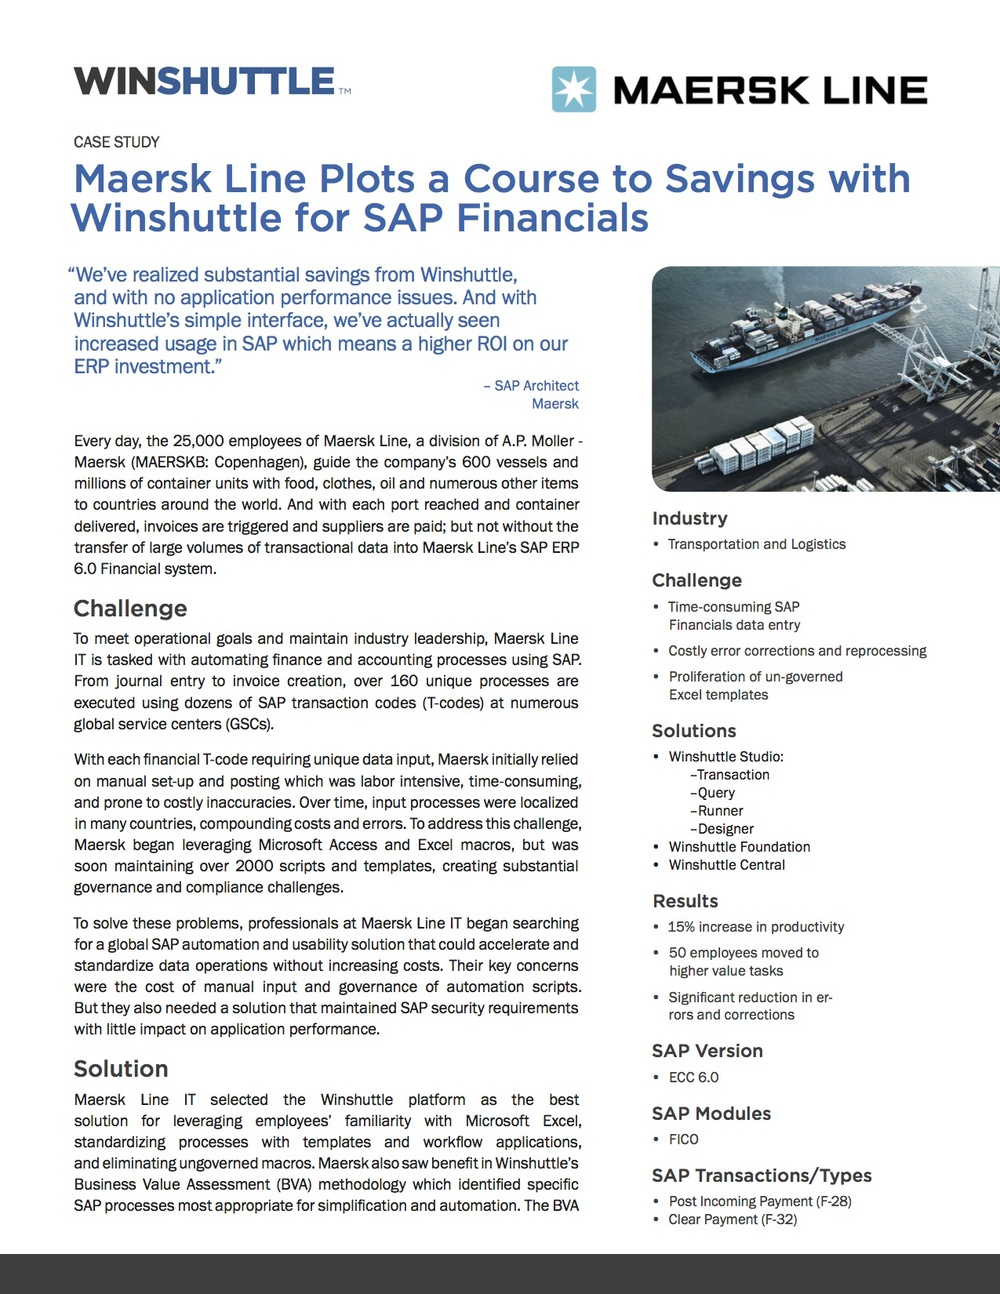 CS-Maersk.jpg